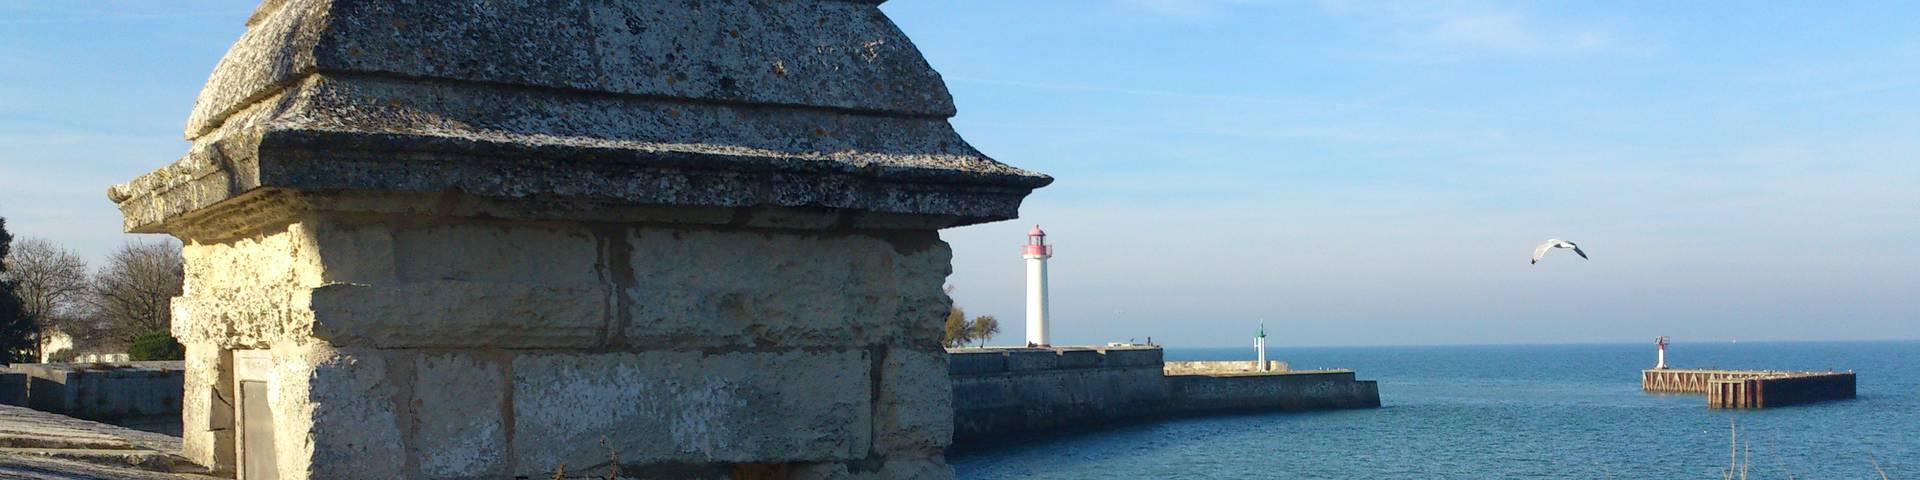 Culture and heritage in Saint-Martin-de-Ré